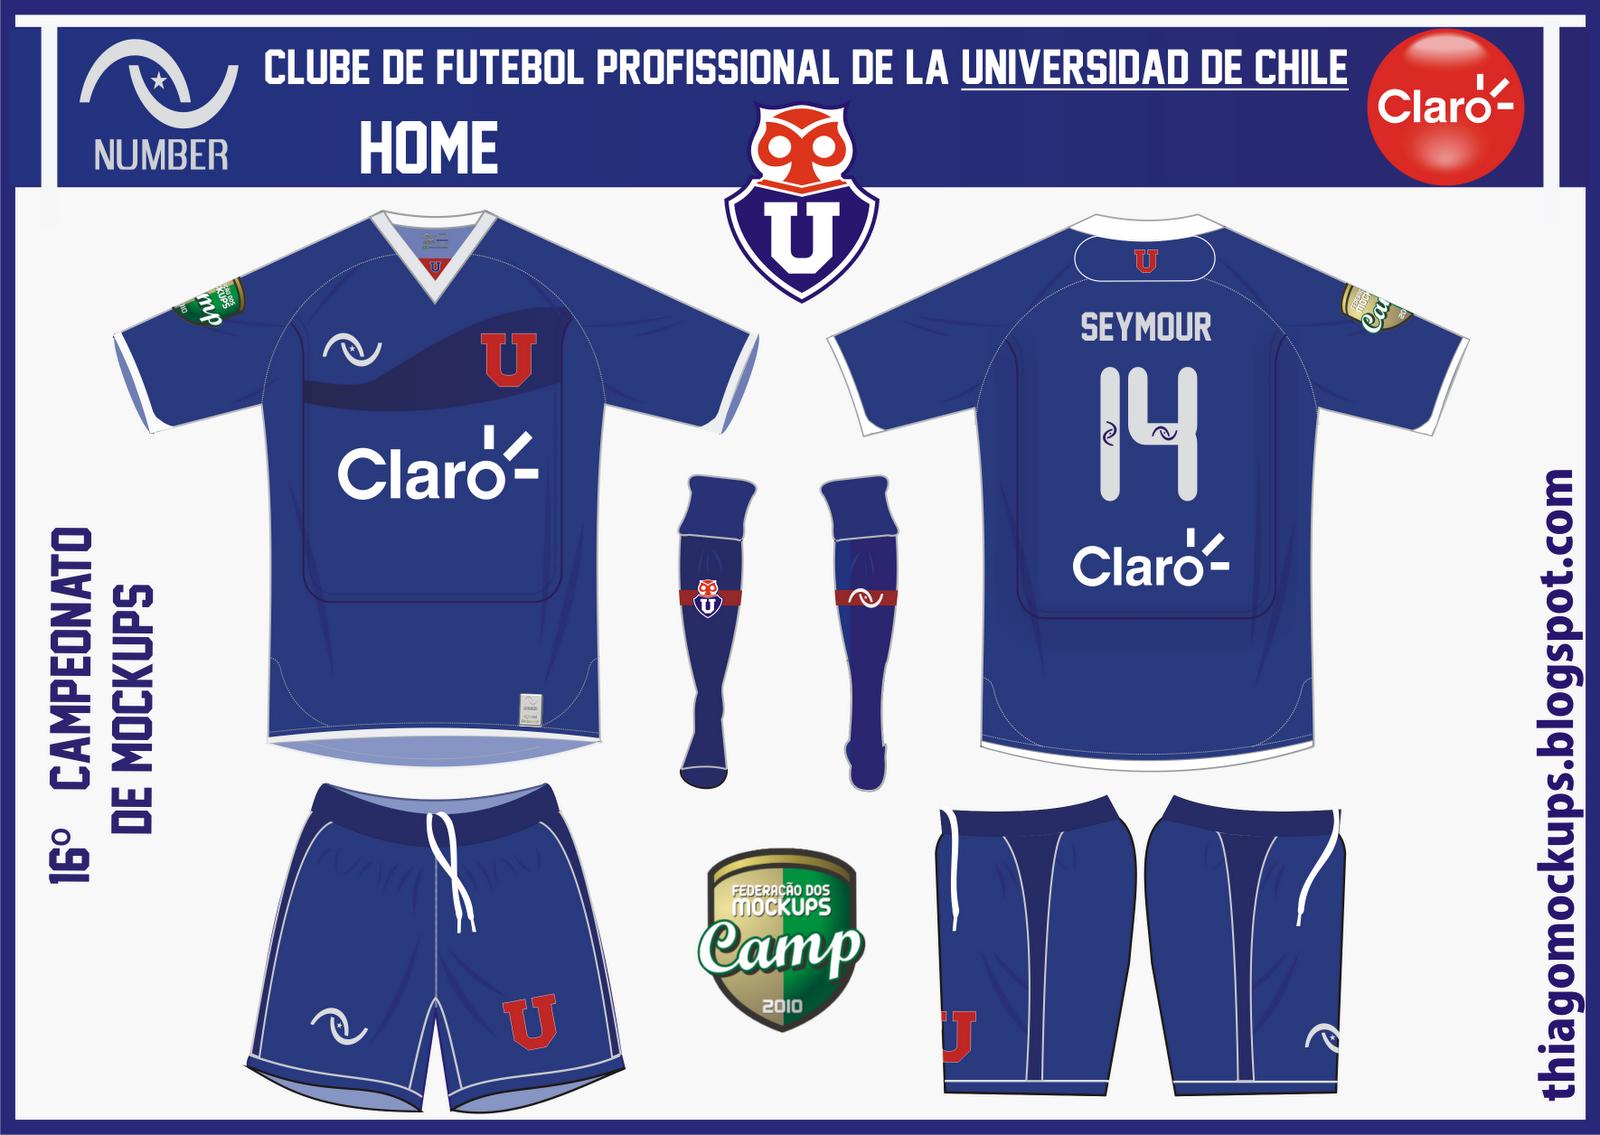 ... Mockups: 16º Campeonato de Mockups - Universidad de Chile / Number